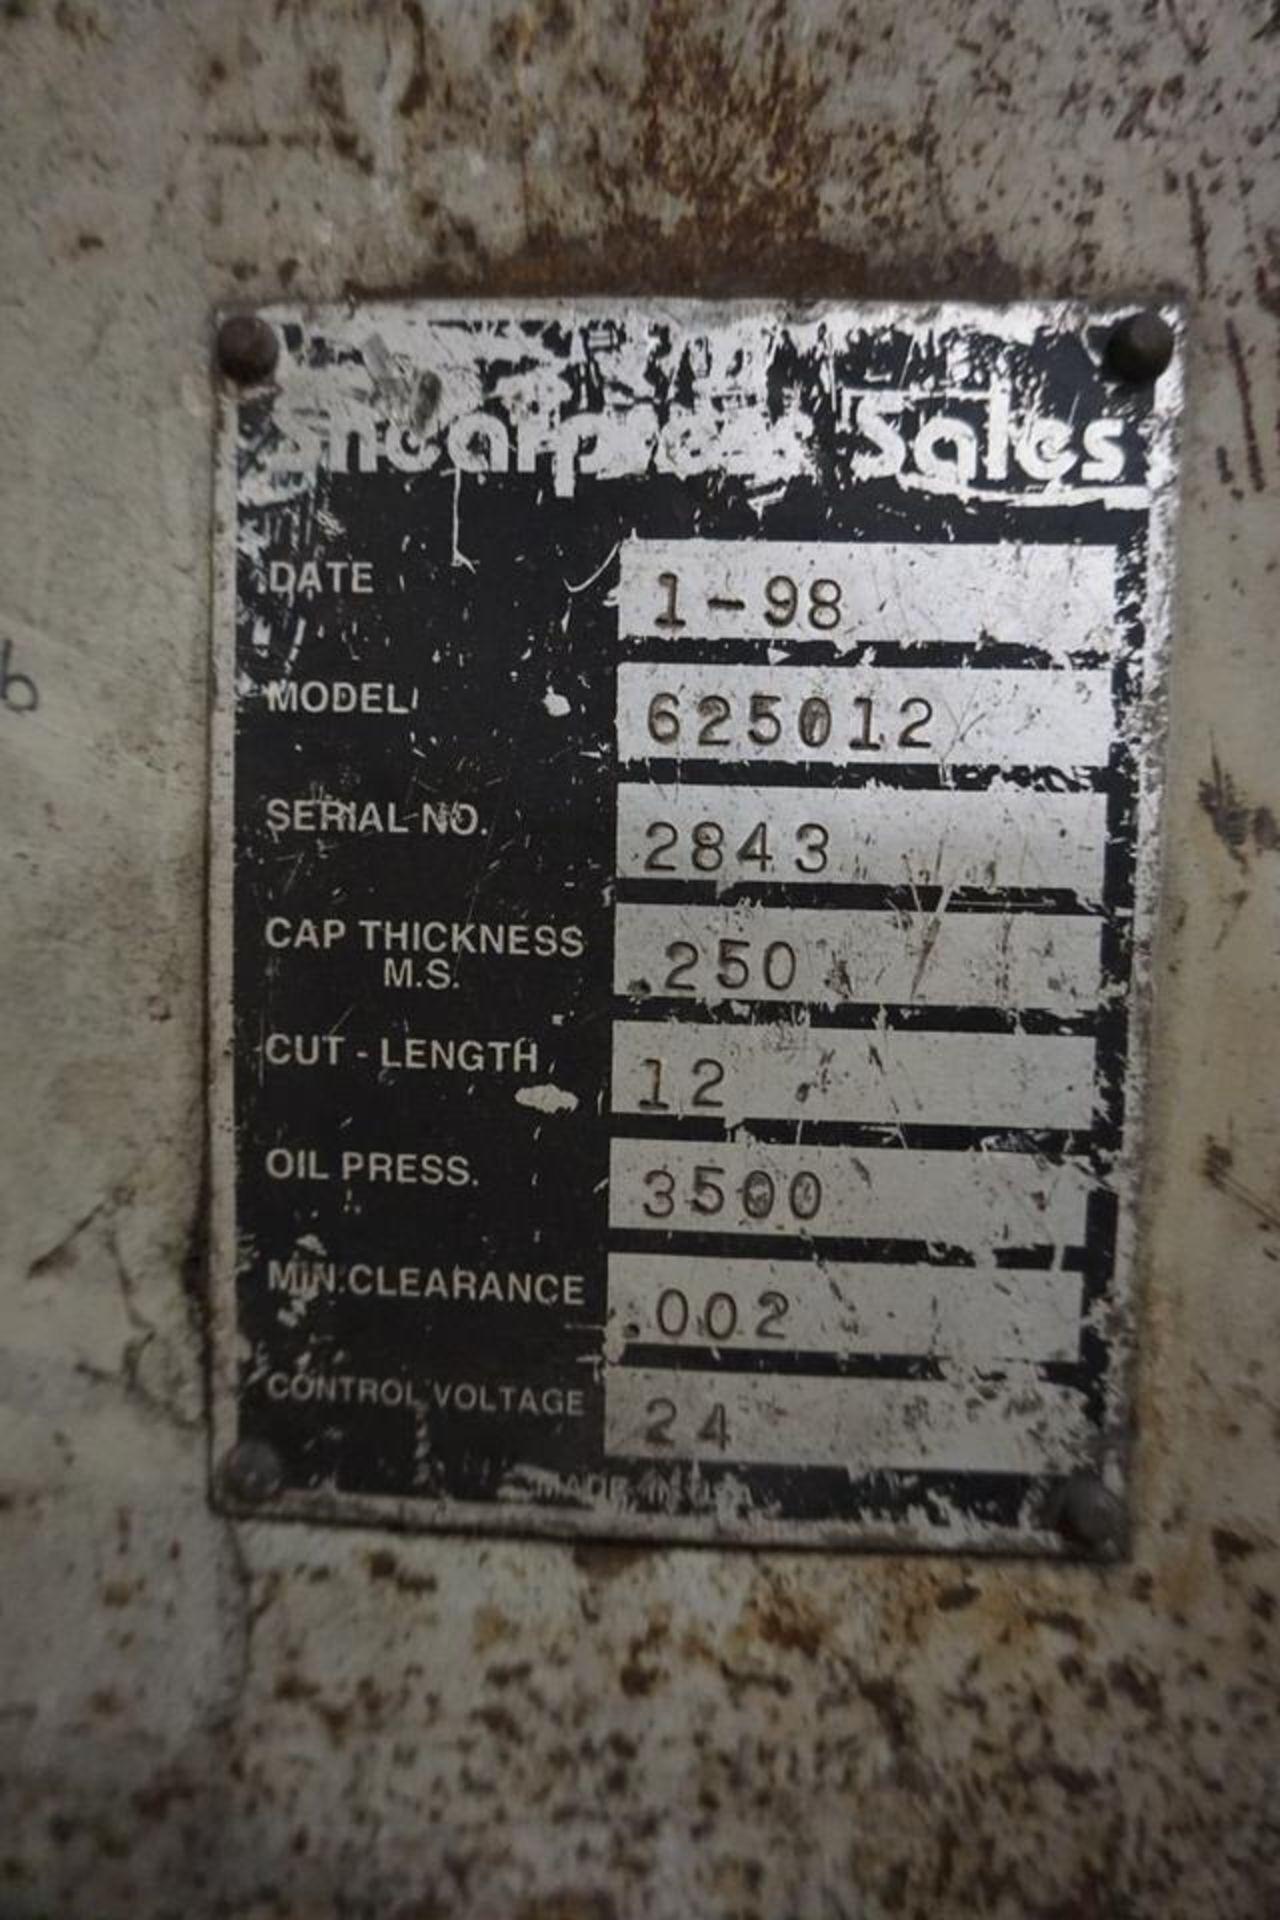 "Lot 1 - 1/4"" X 12' ACCURSHEAR 625012 Power Squaring Shear"